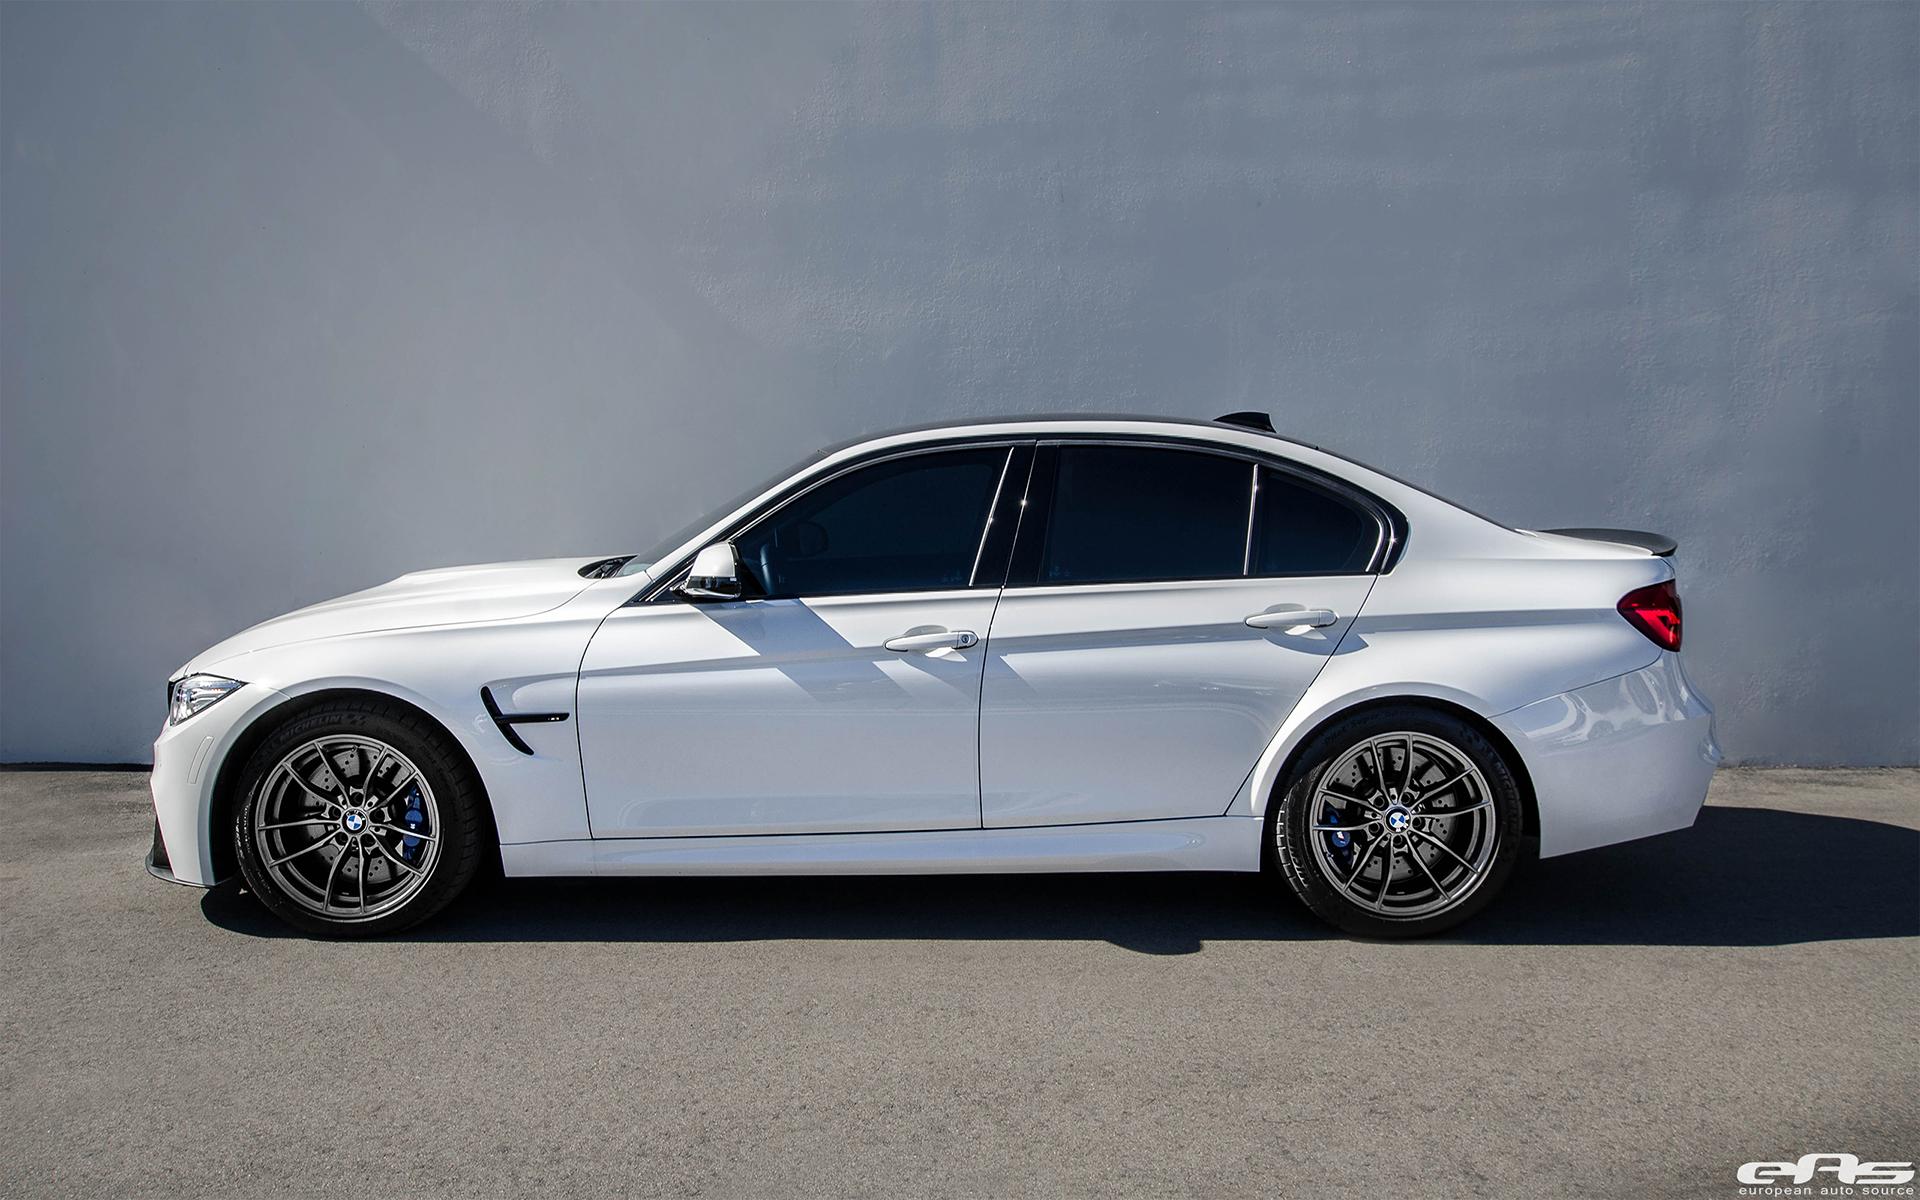 Alpine White Bmw F80 M3 Gets Visual Mods Added